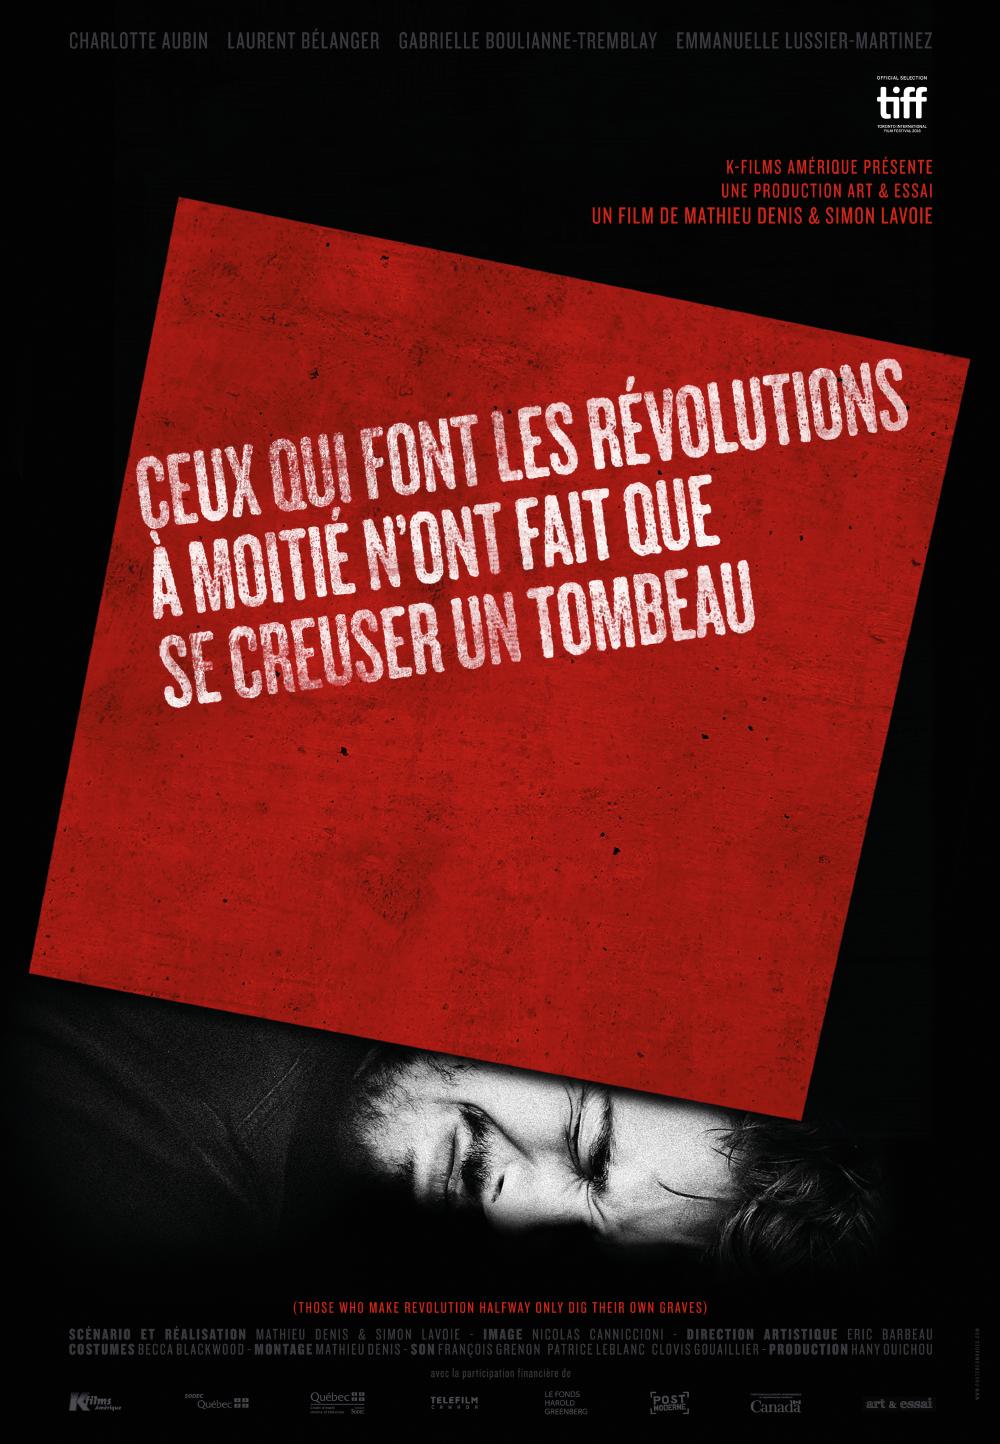 postercomrades-camaradesaffichistes-Renzo-130.PNG